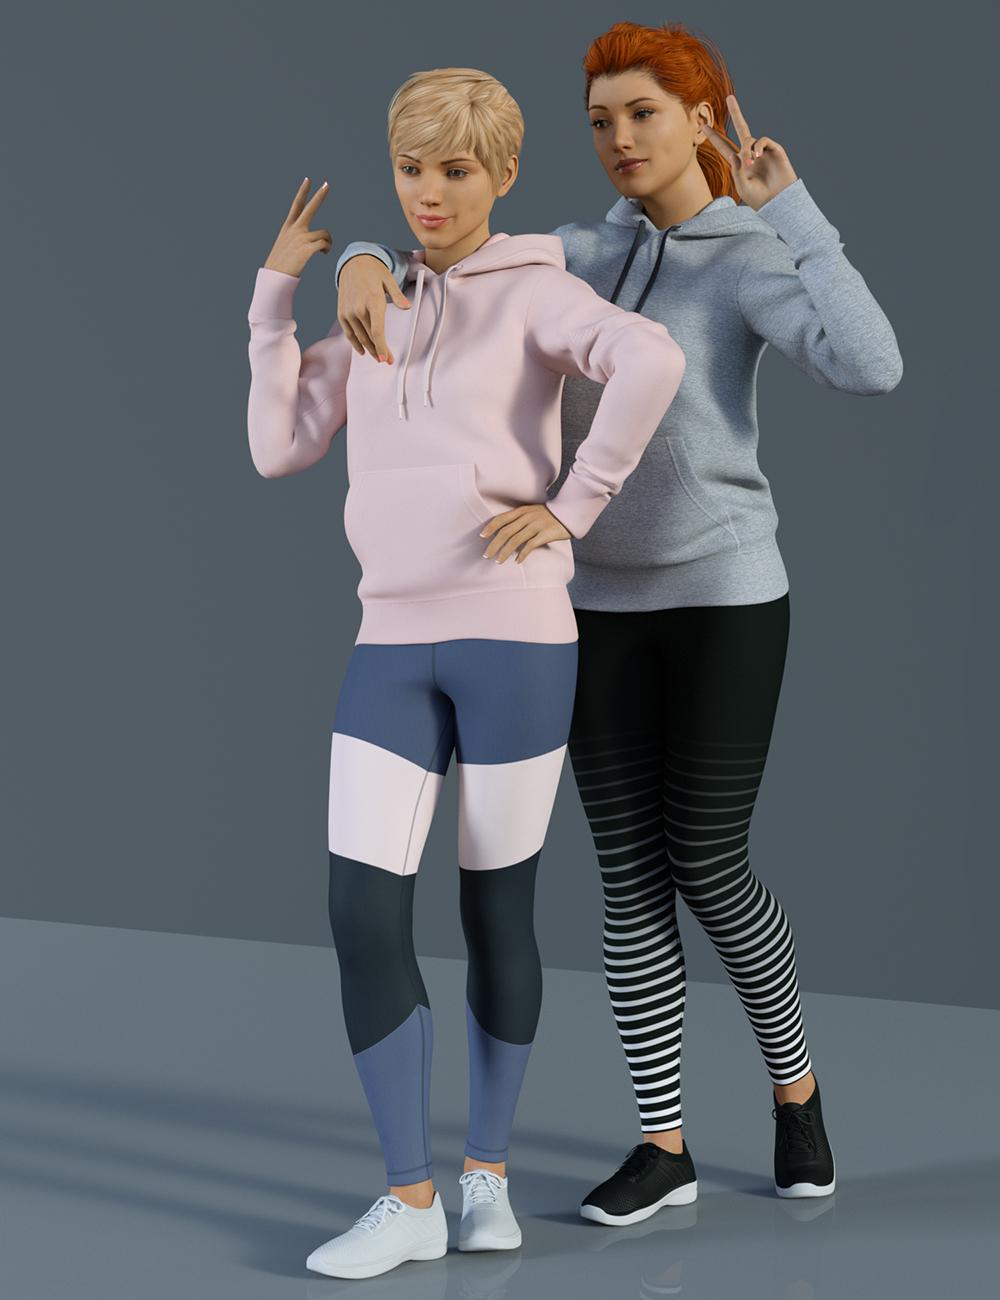 H&C Hoodie & Training Wear for Genesis 8 Female(s) by: IH Kang, 3D Models by Daz 3D